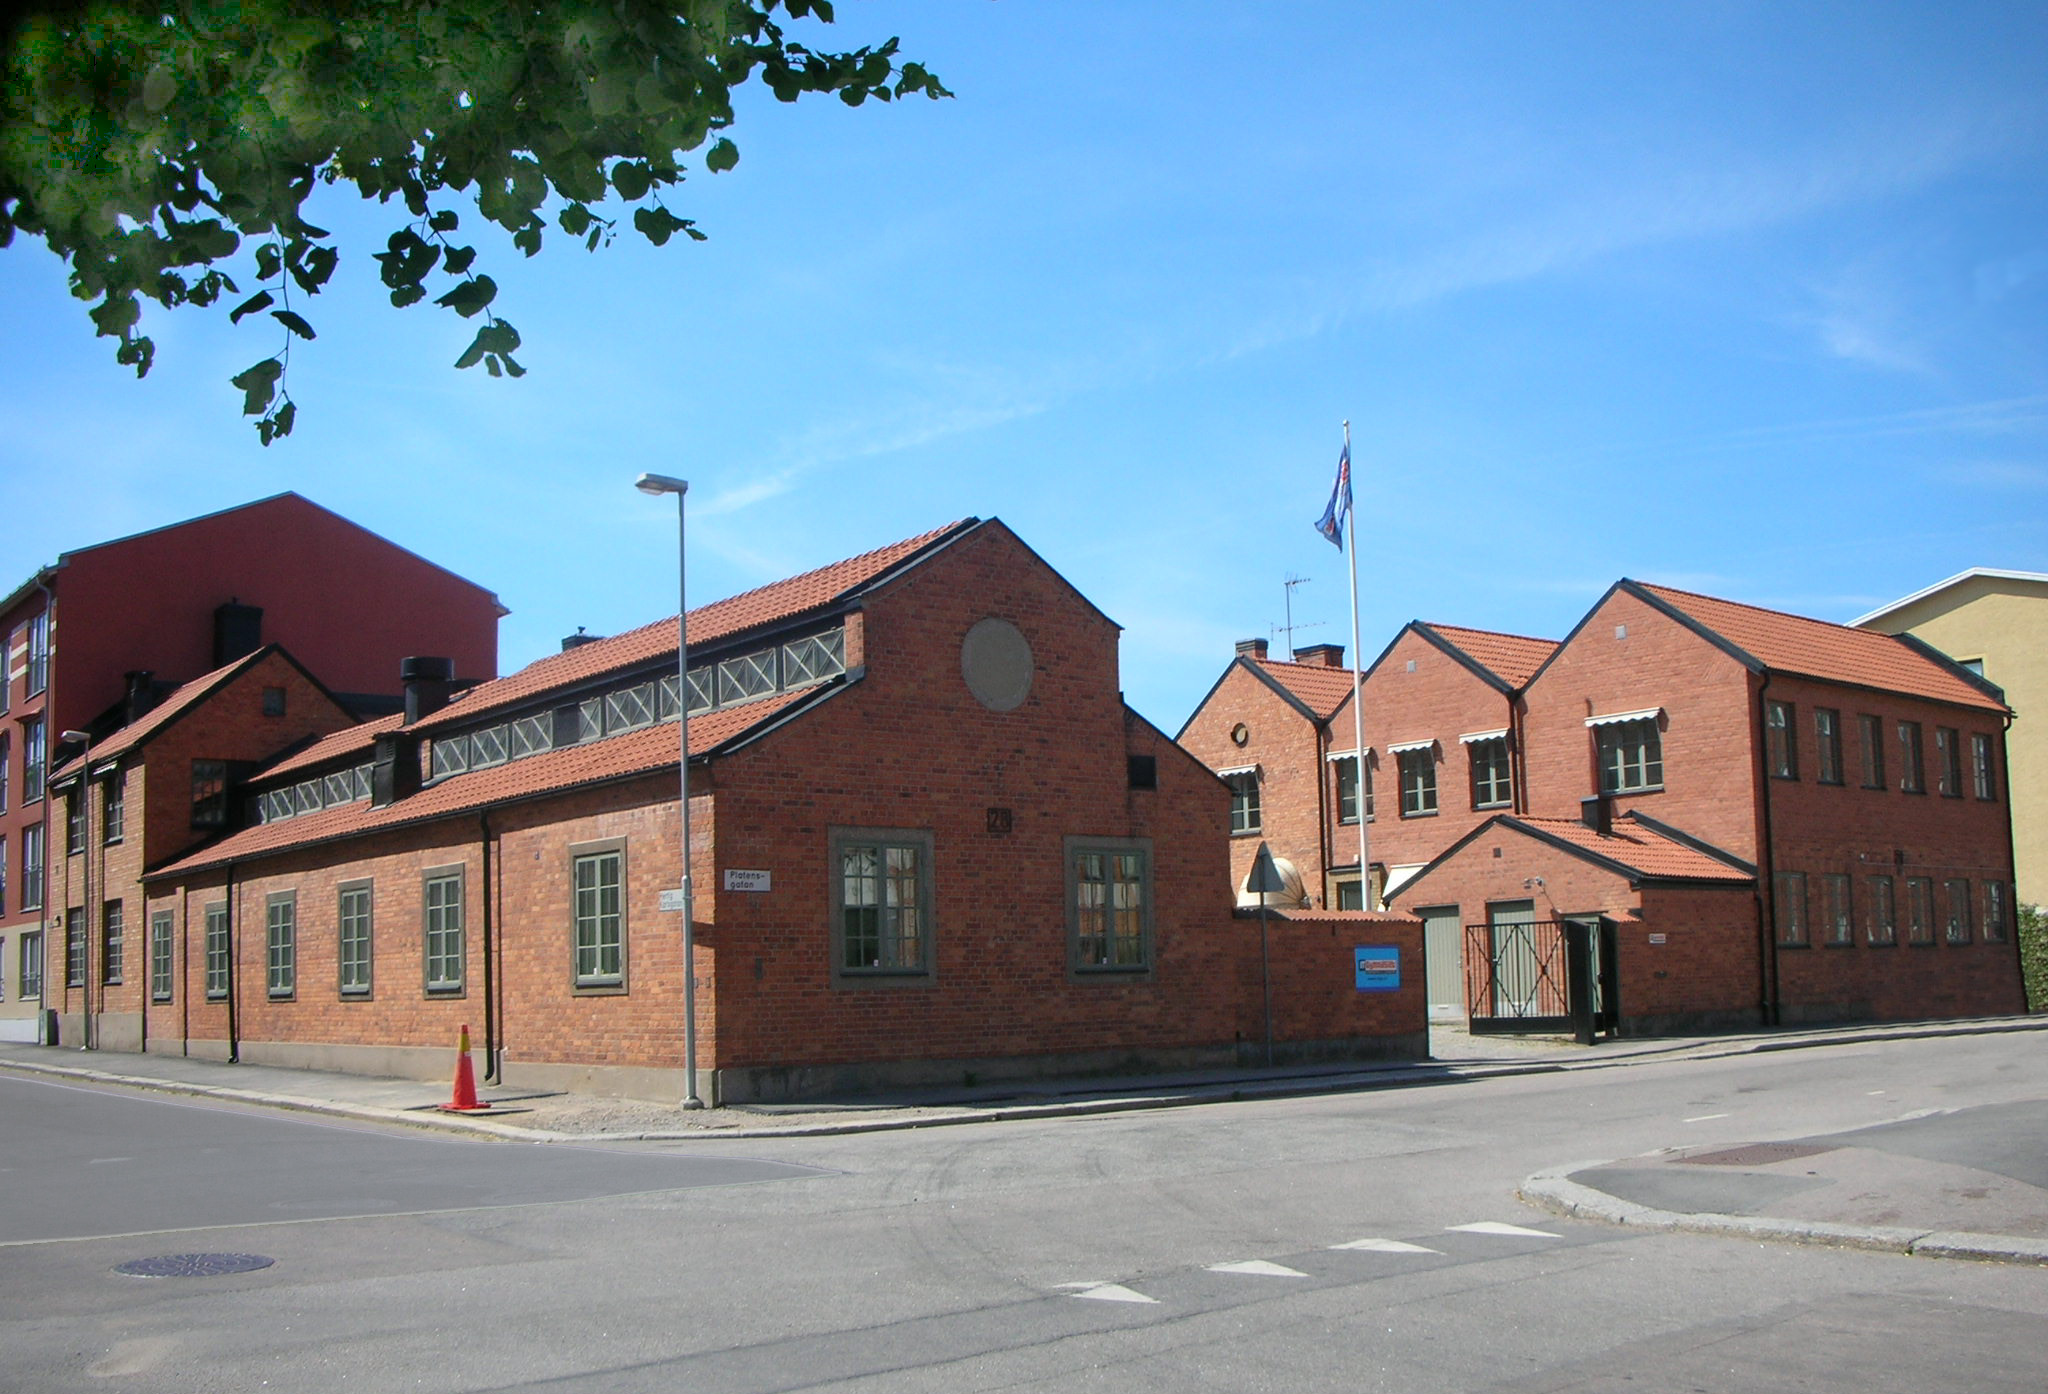 Platensgatan 28